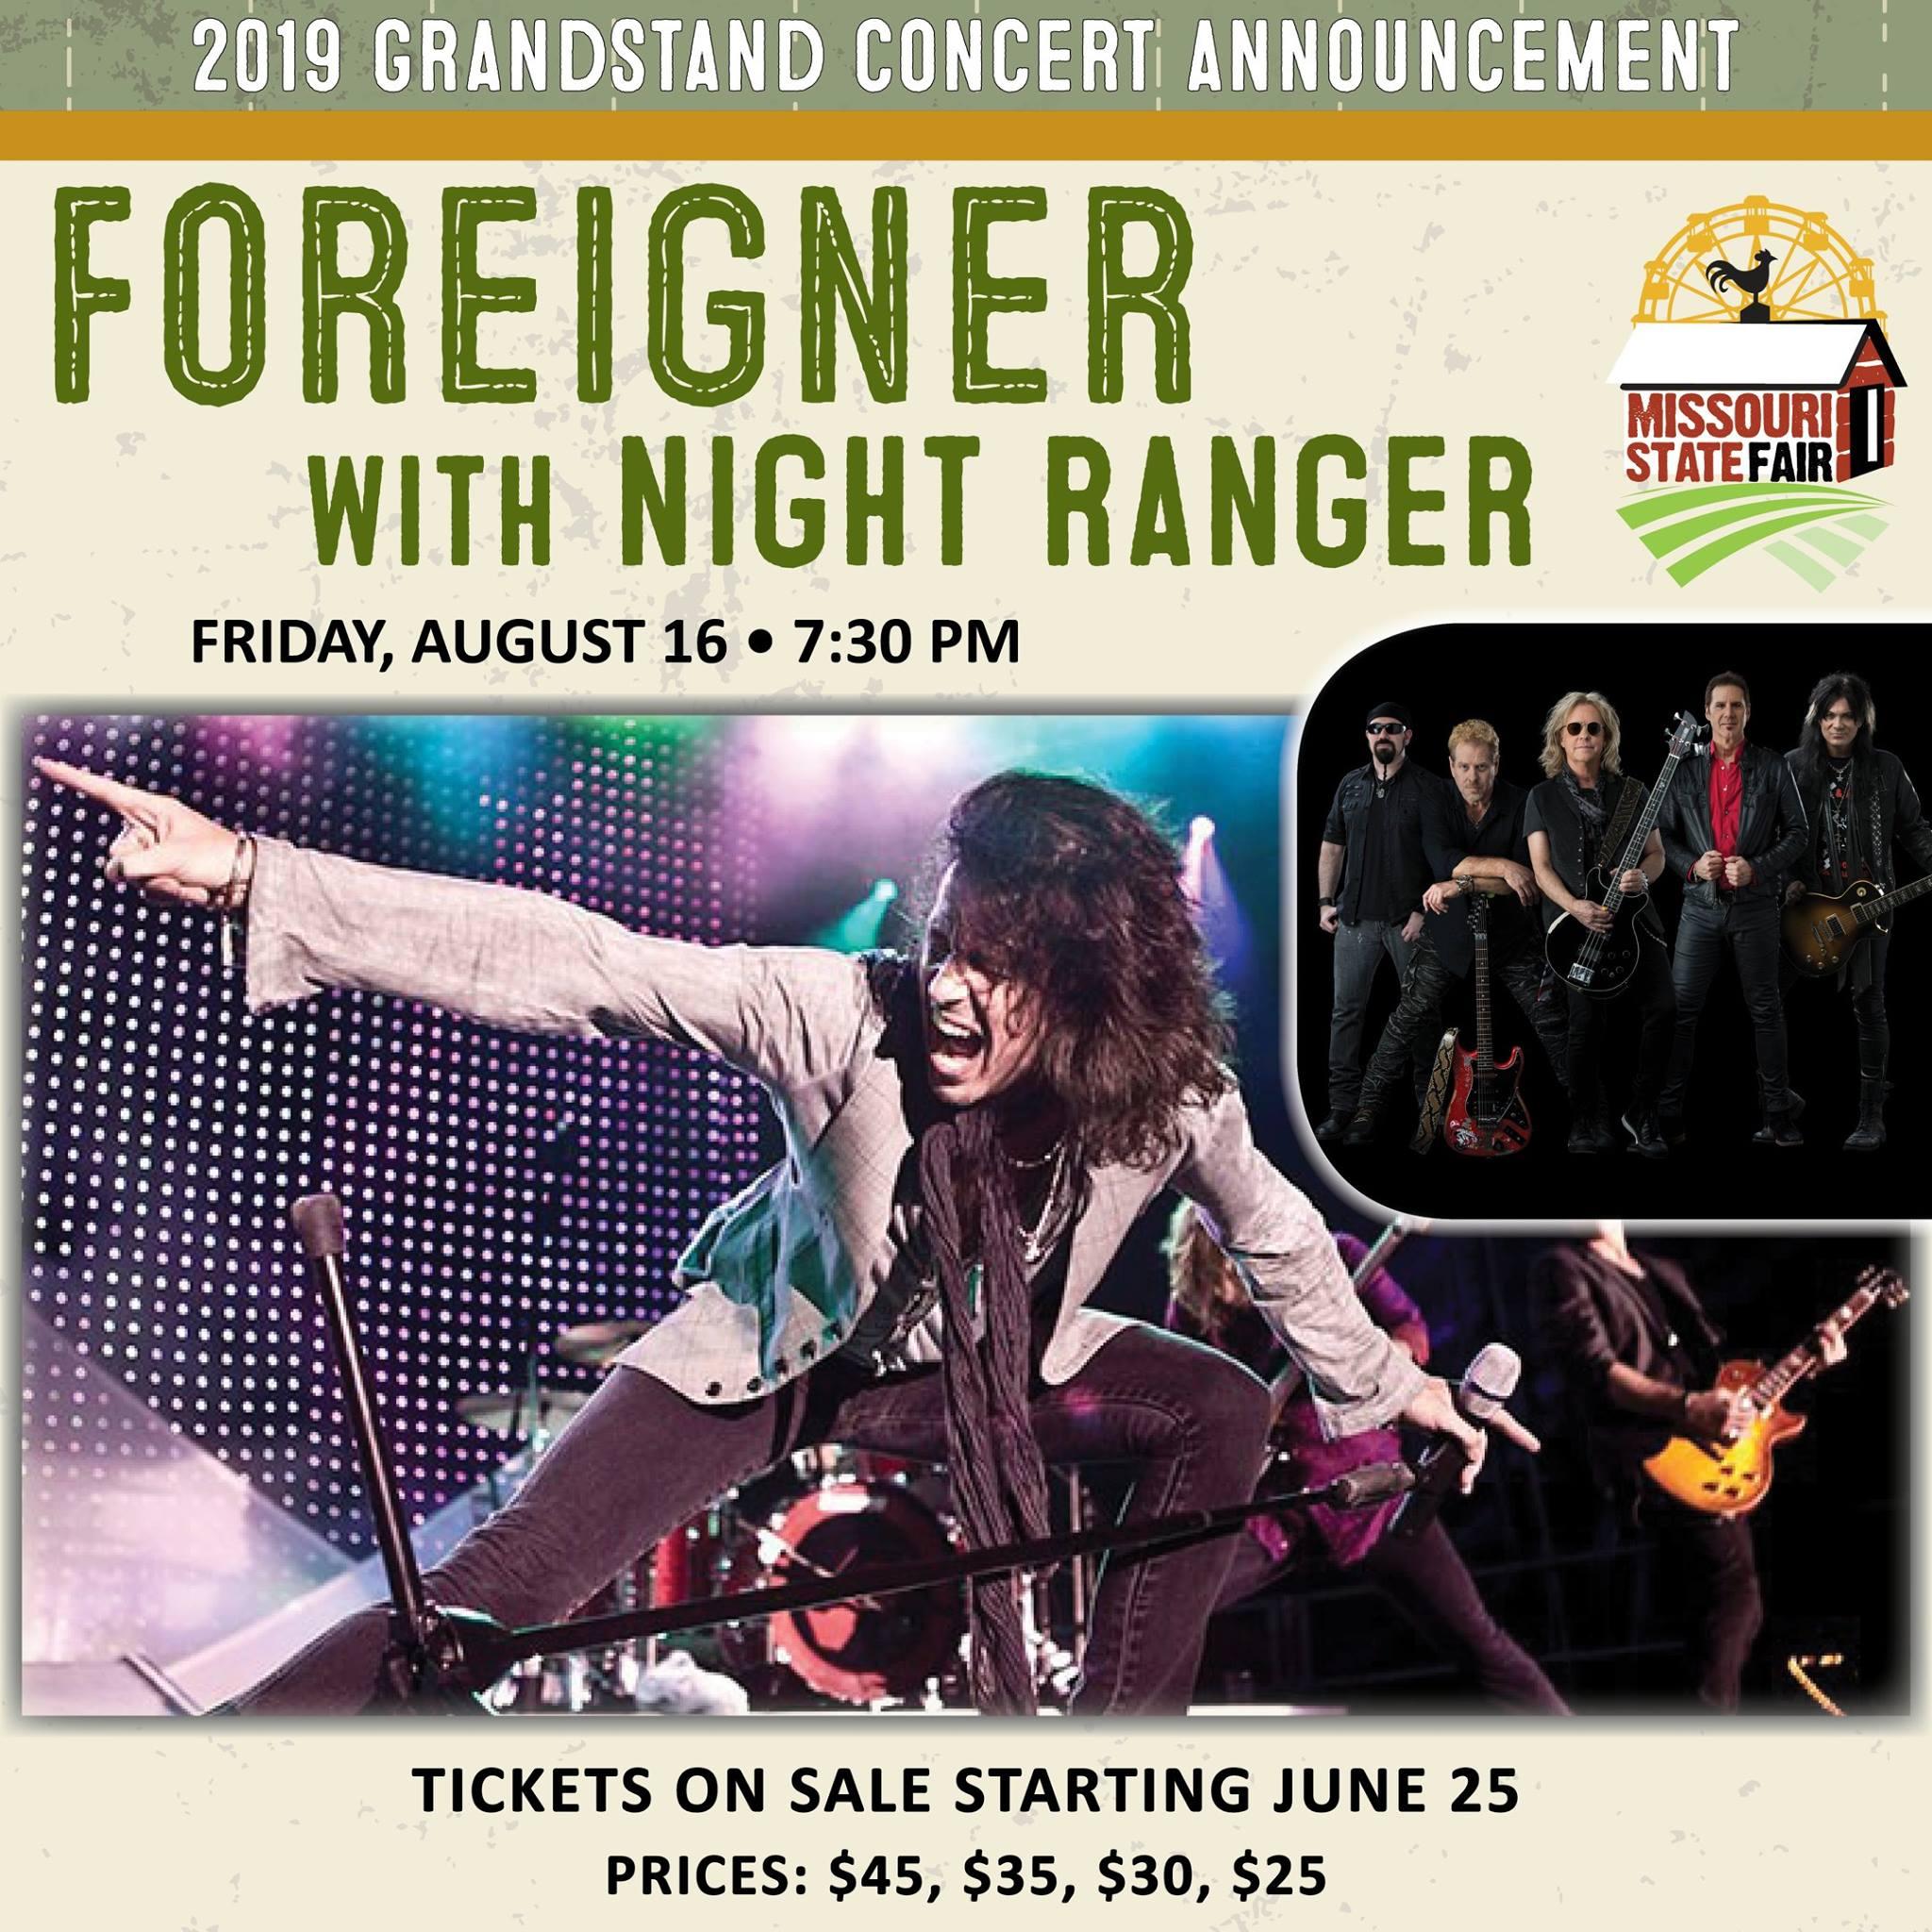 Missouri State Fair announces Foreigner, Night Ranger for 2019 concert series